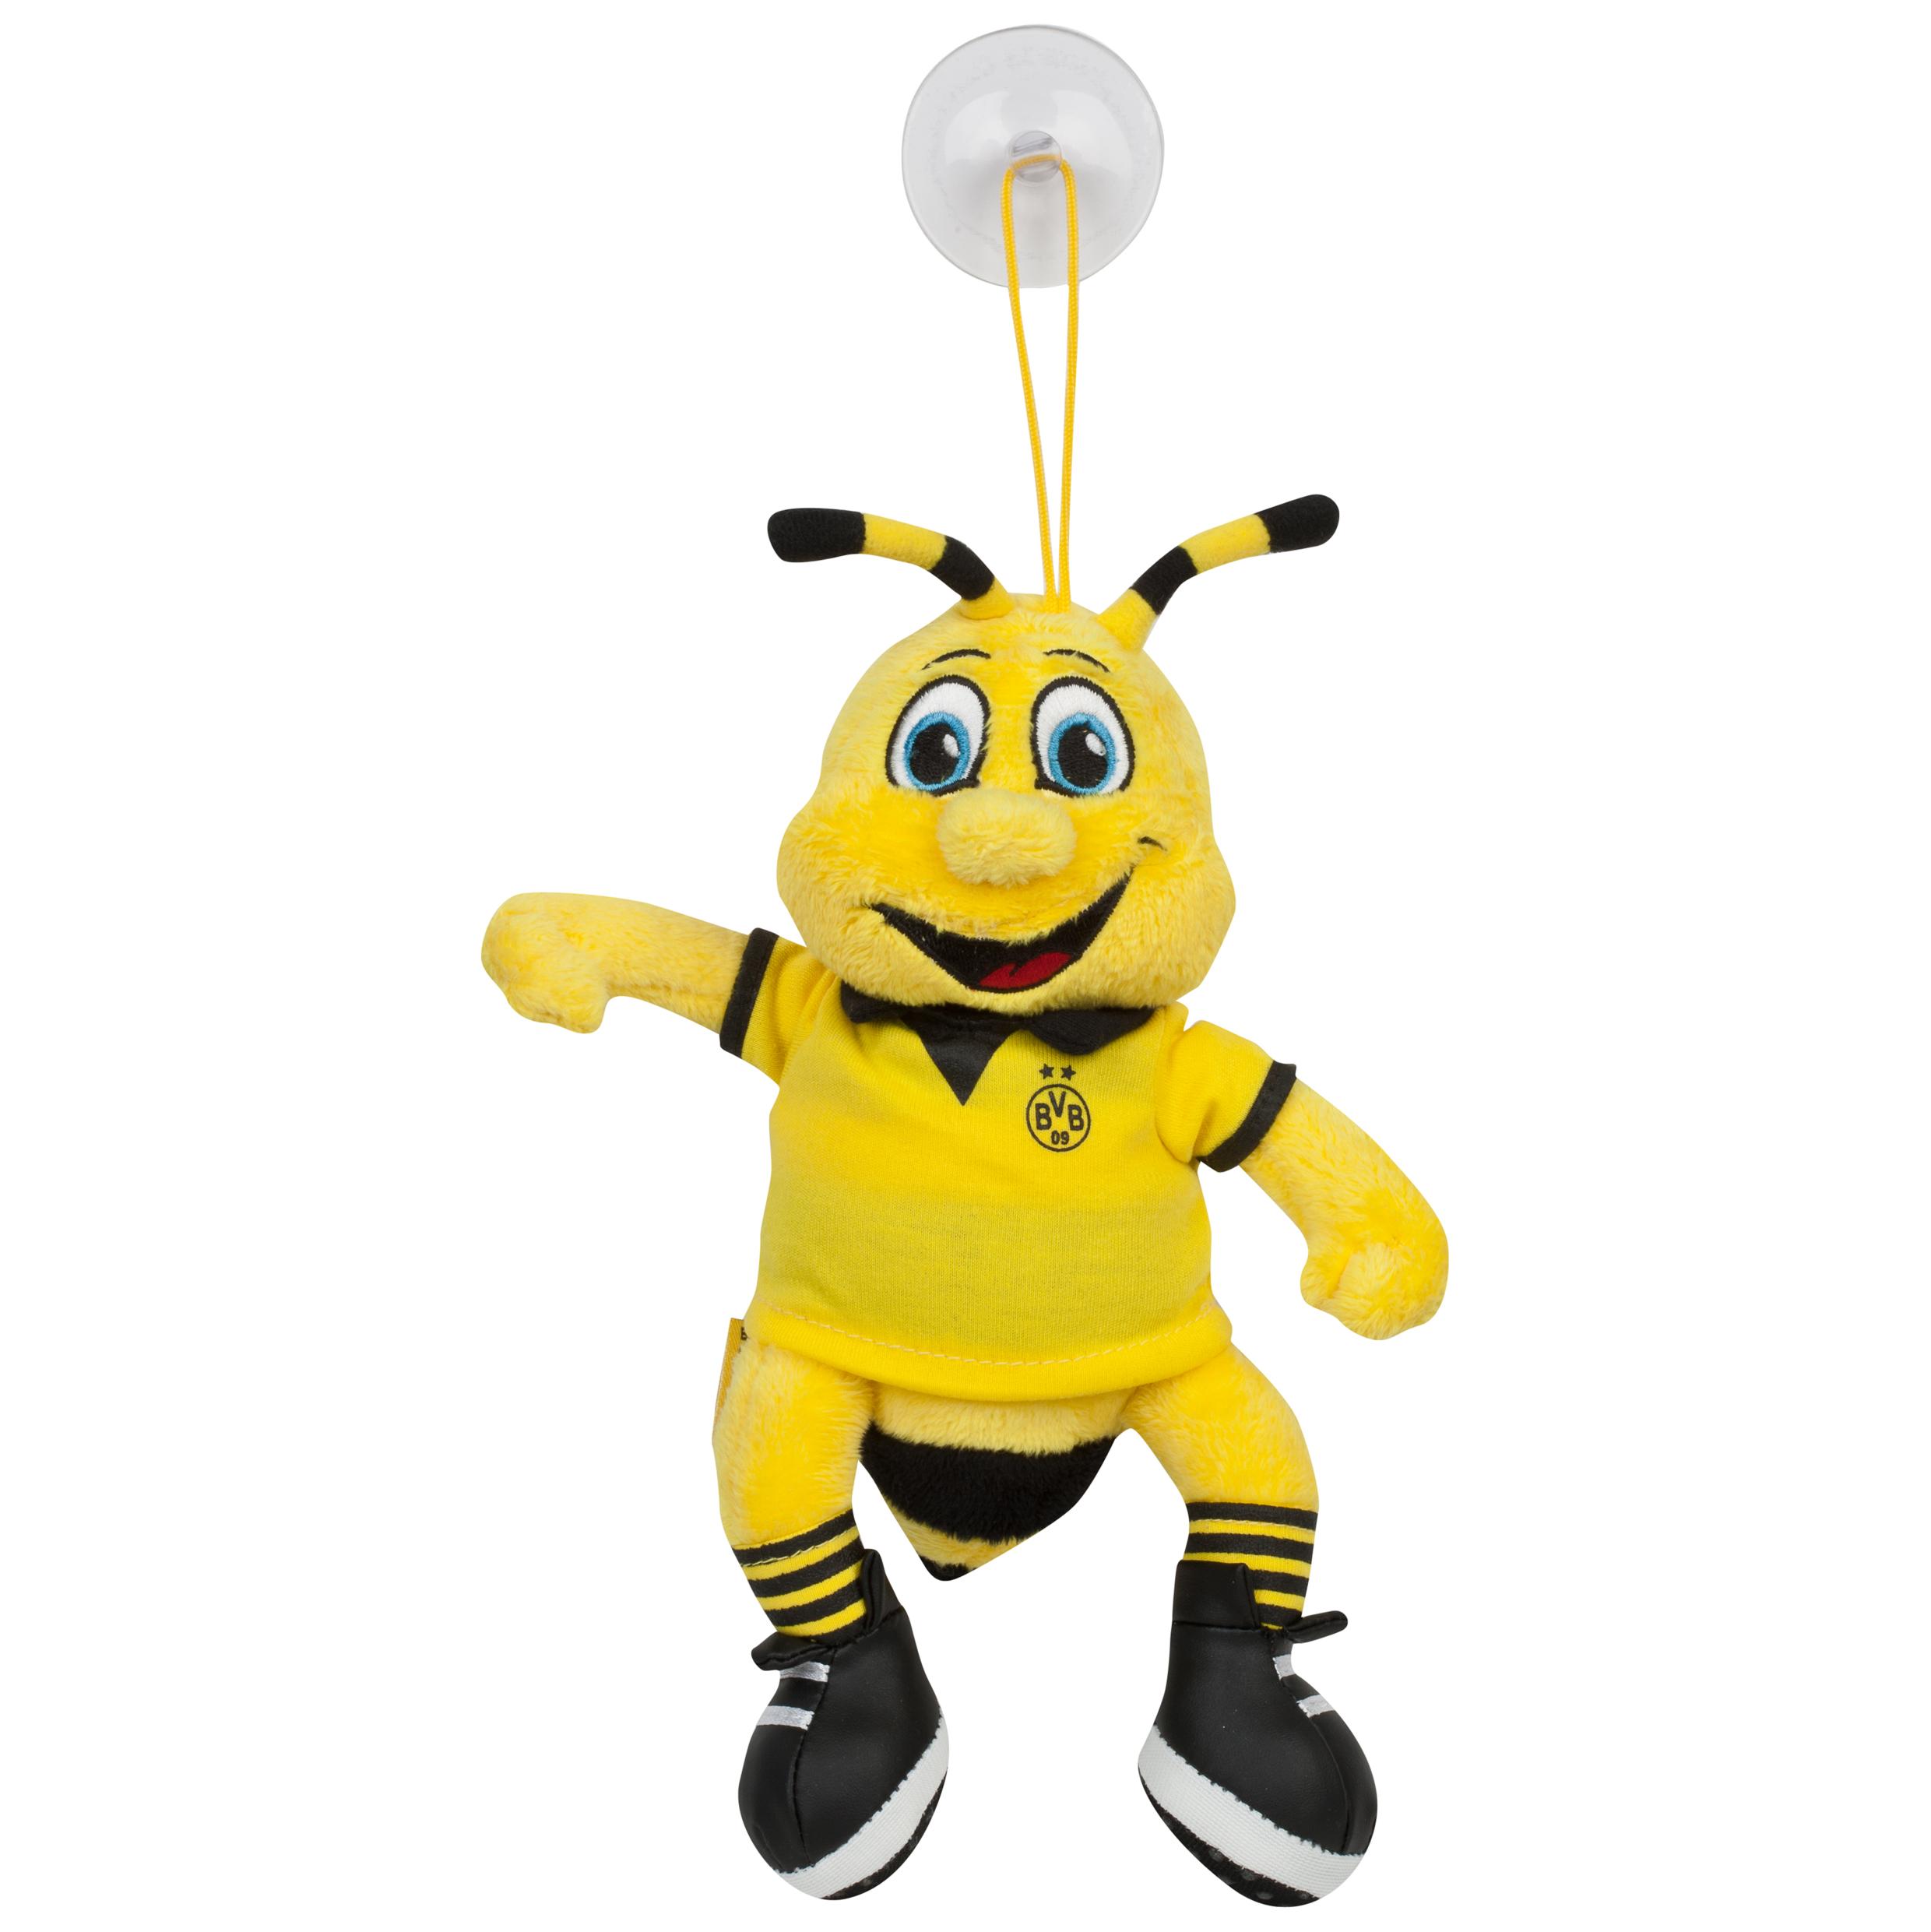 Image of BVB EMMA Mascot Plush with Sucker